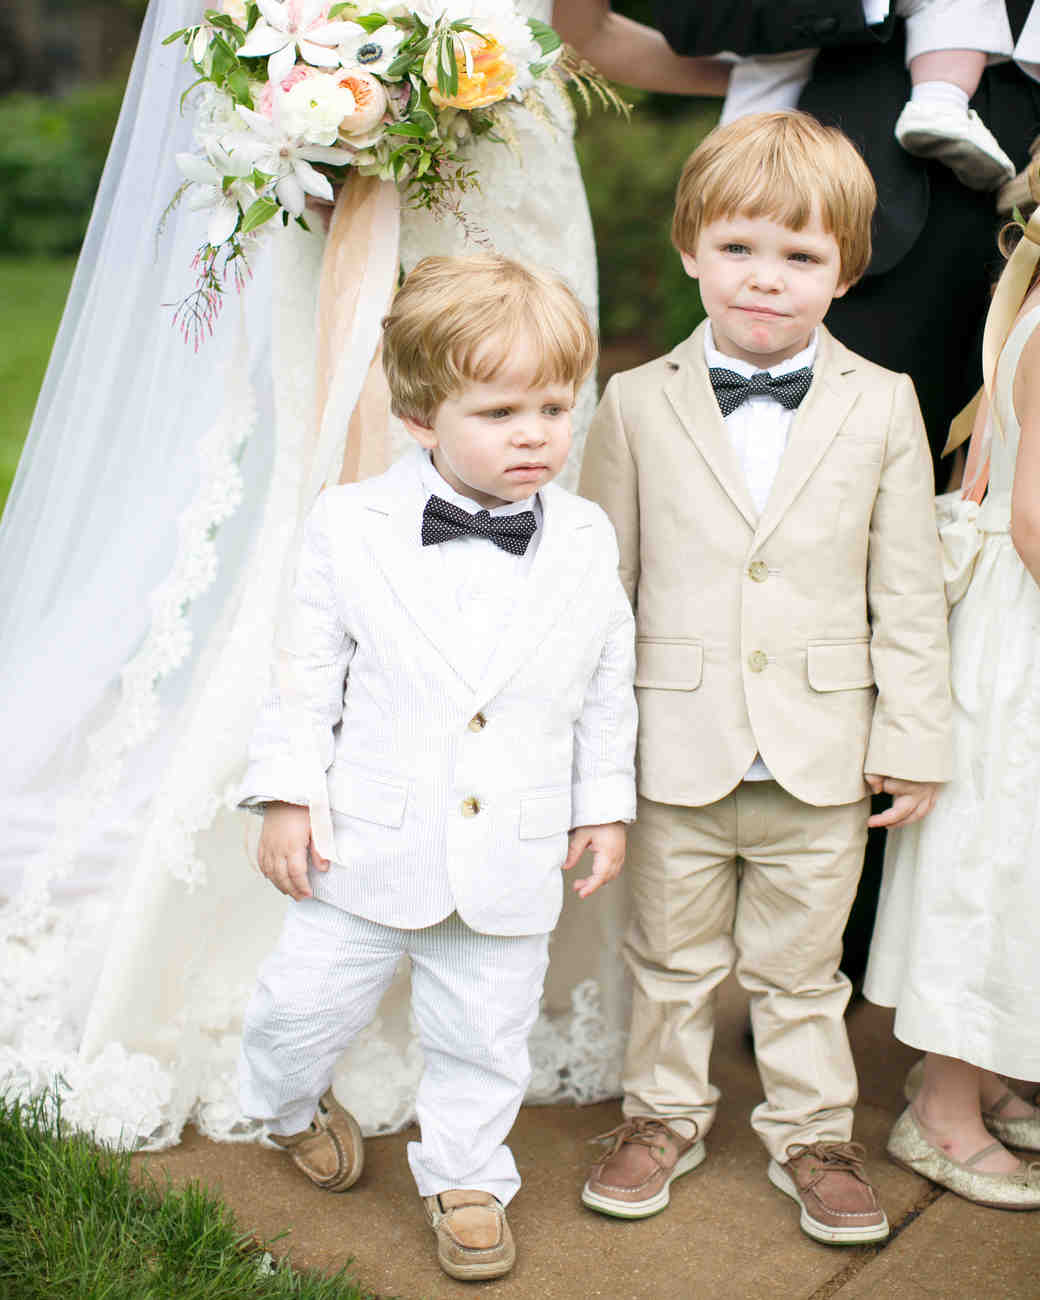 courtney-michael-wedding-06-s111677-0215.jpg